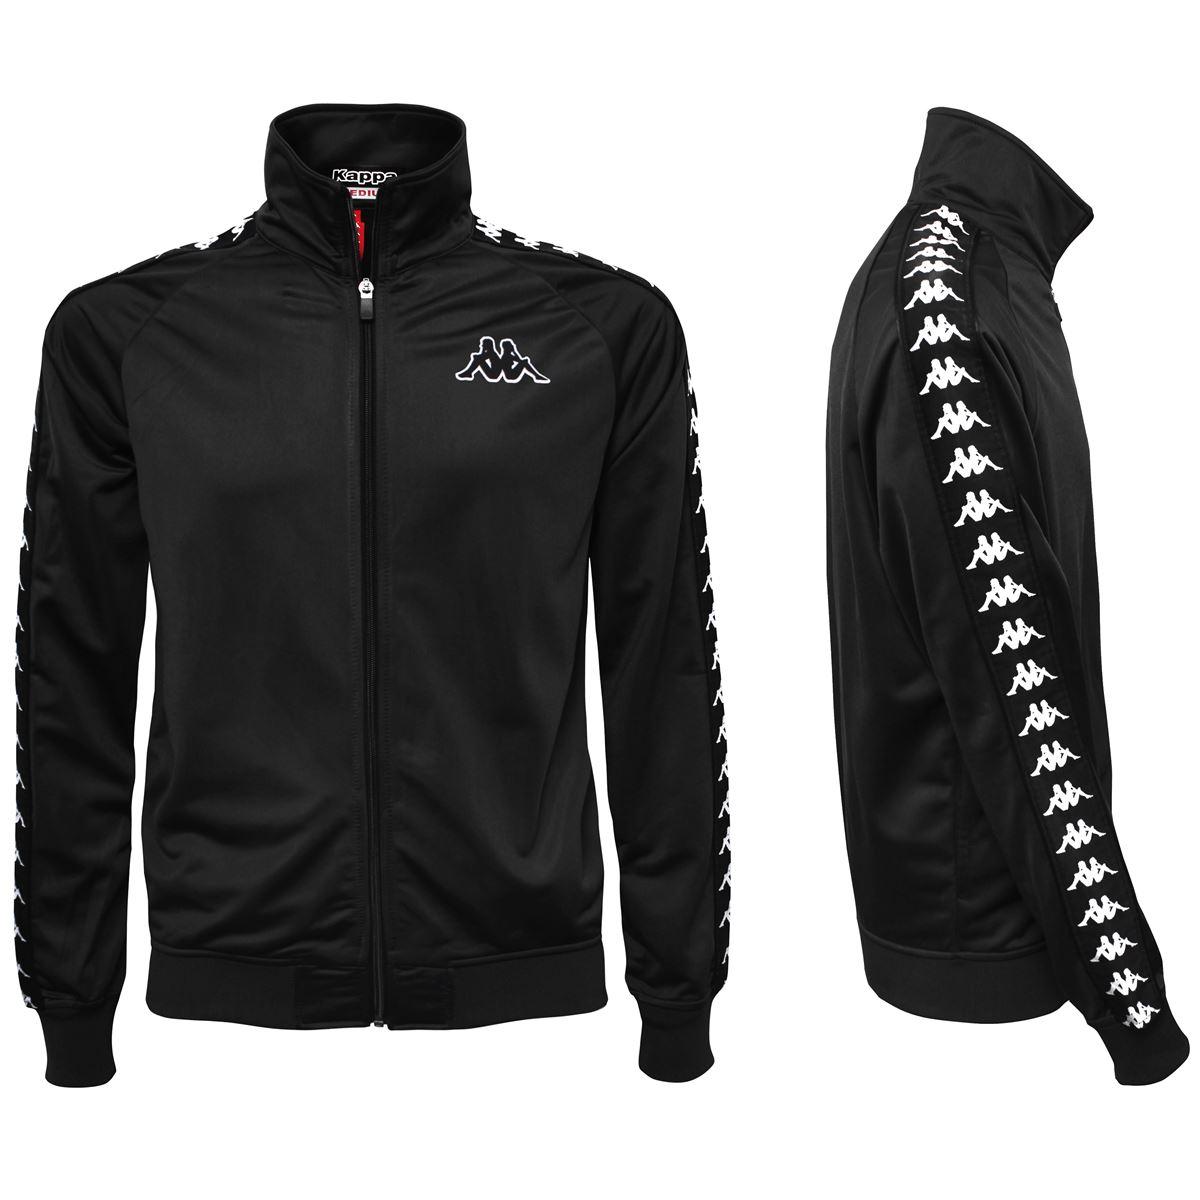 Felpa da uomo in tricot garzato Kappa | Felpe | 301EFU0J61 BLACK-BLACK